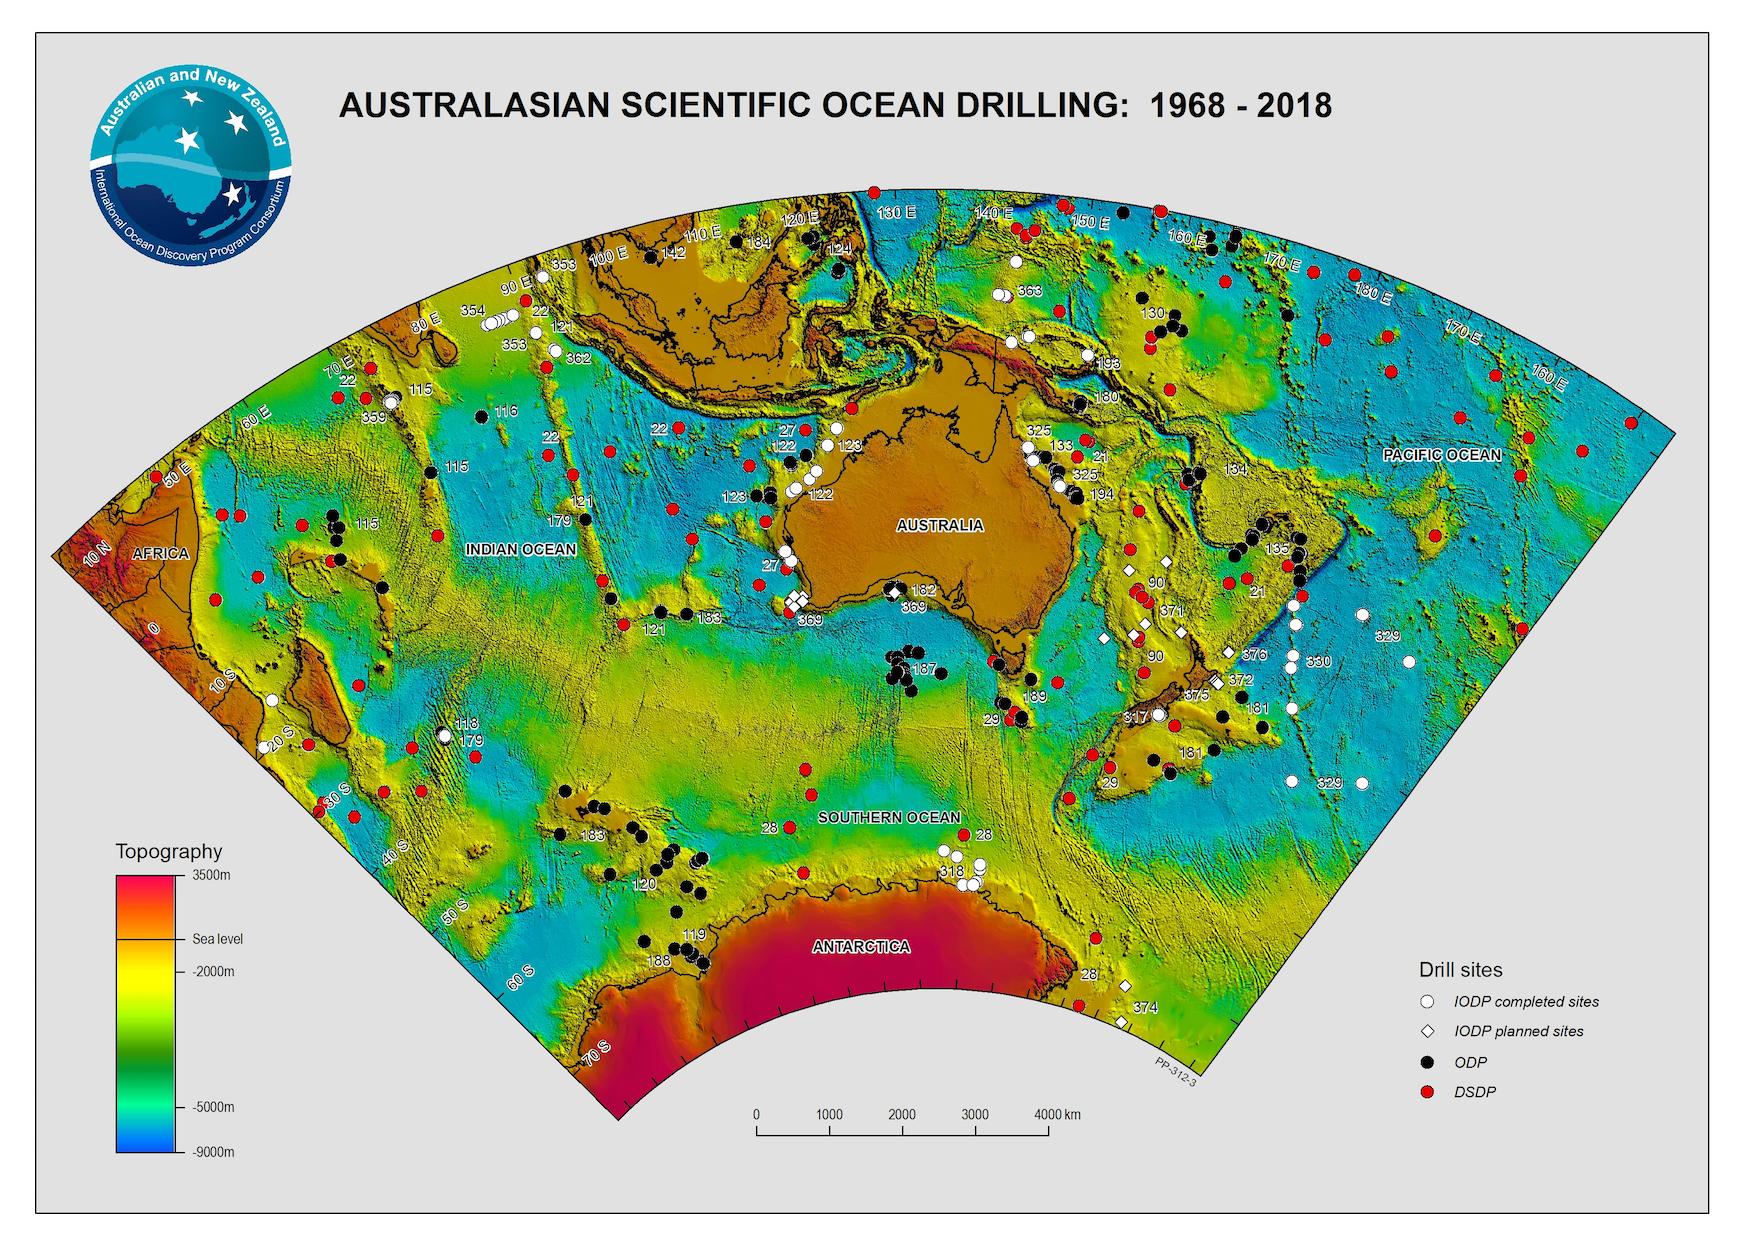 Australian Scientific Ocean Drilling (1968-2018), from Geoscience Australia